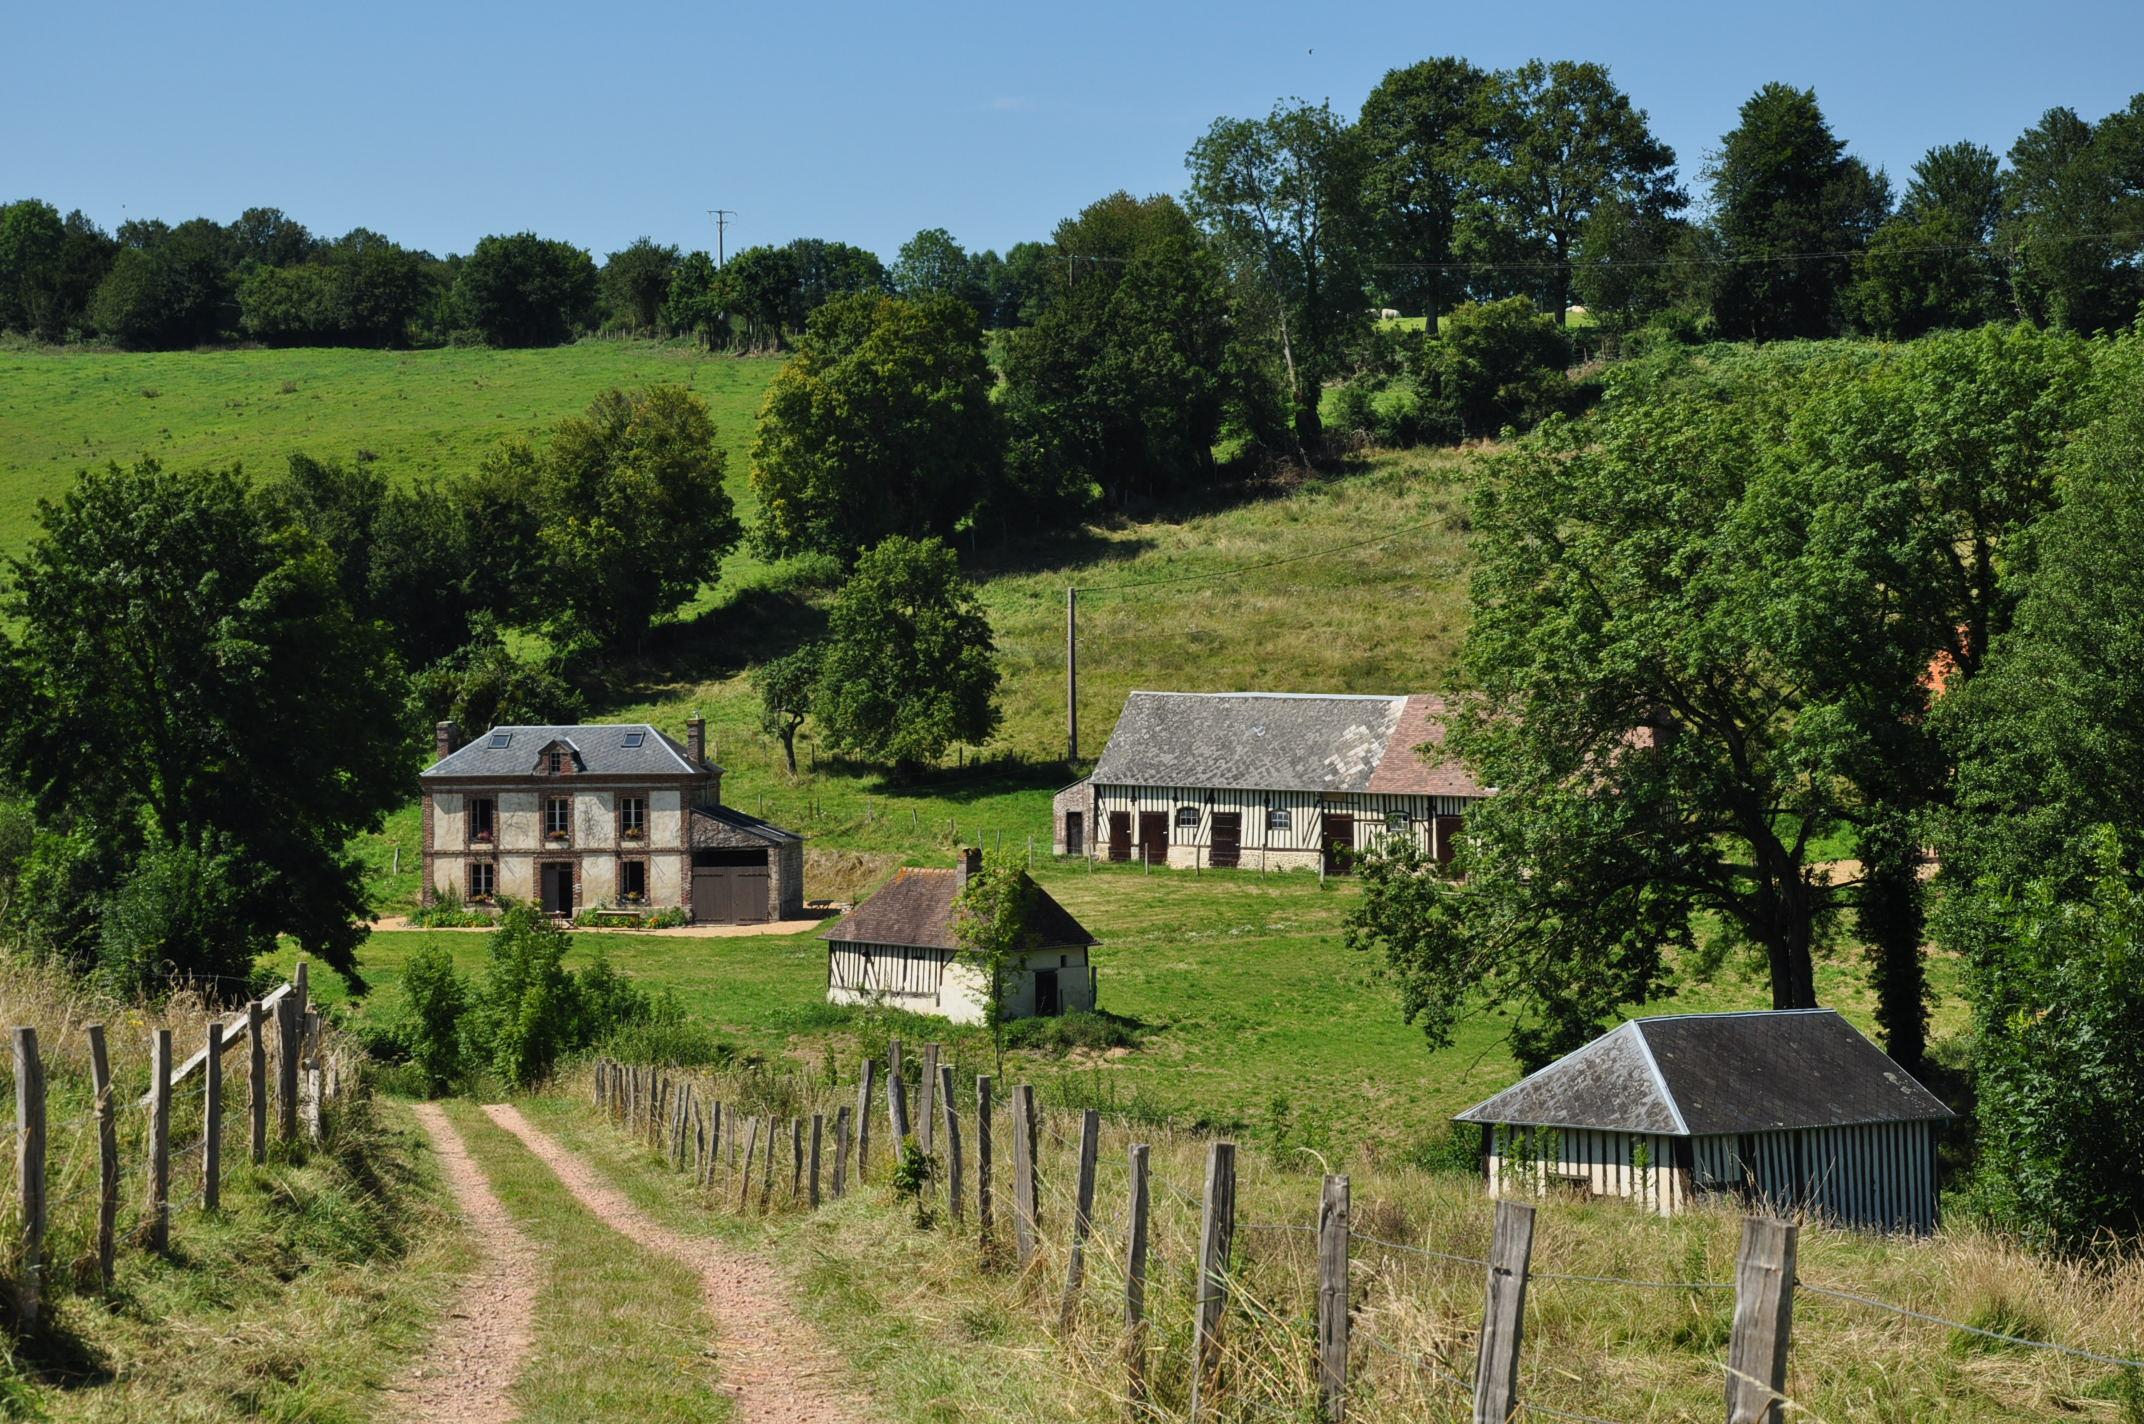 File:France, Calvados, Auquainville (3).JPG - Wikimedia